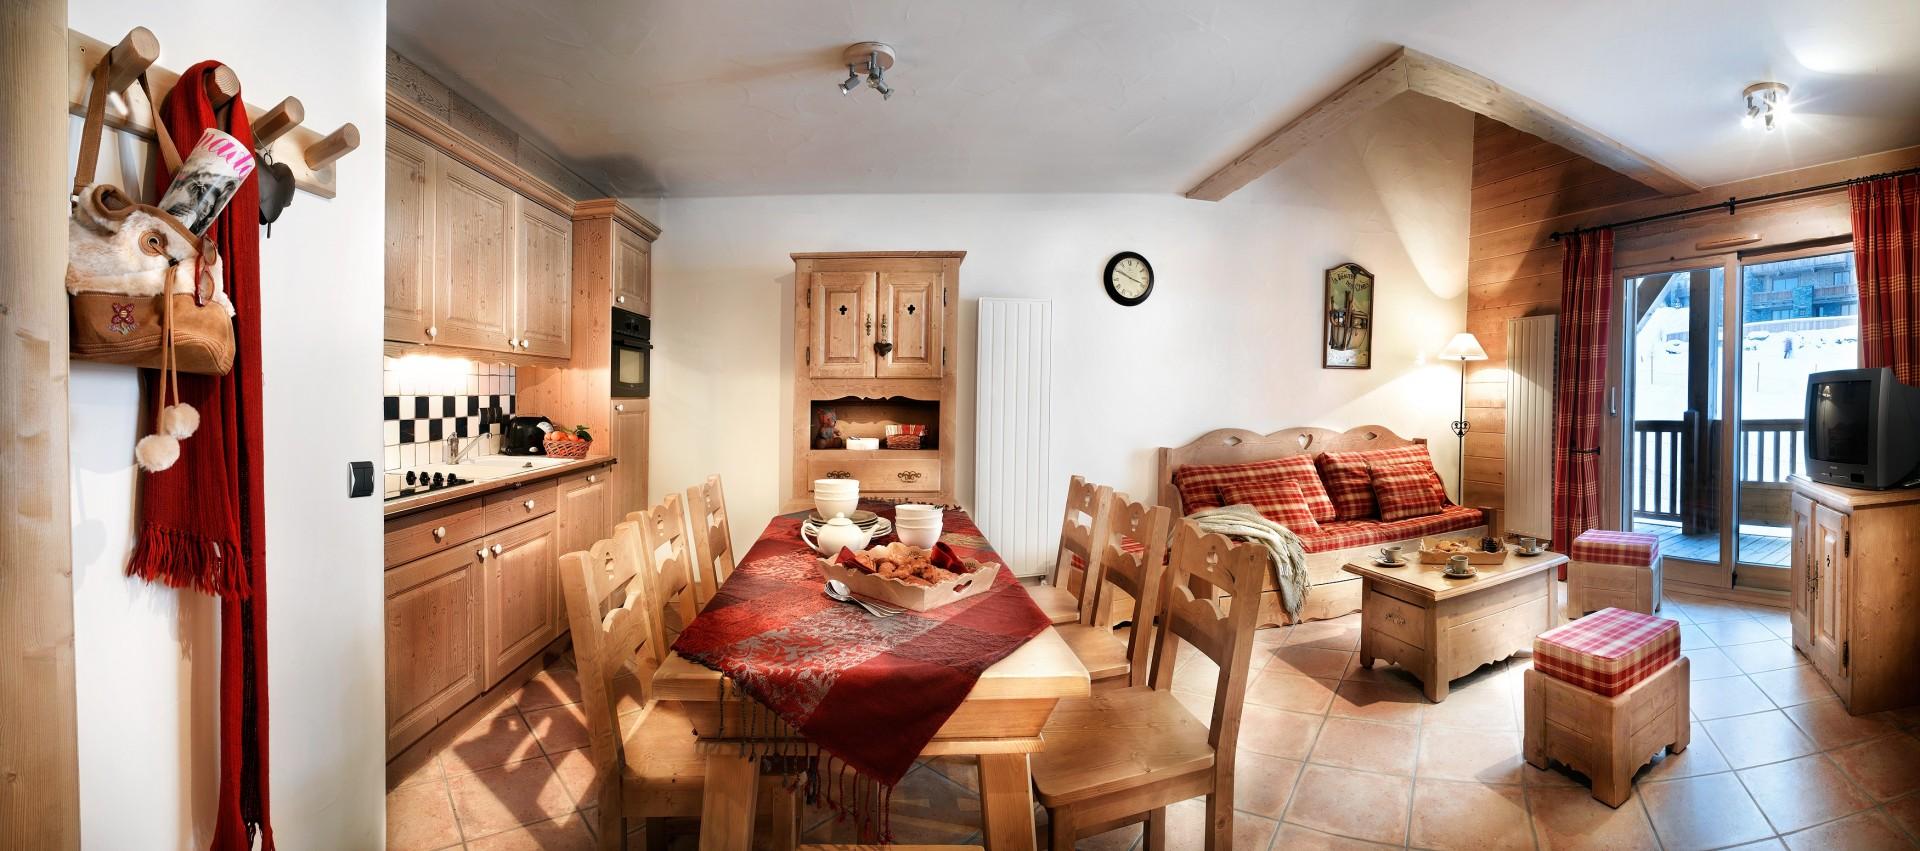 sainte-foy-tarentaise-location-appartement-luxe-love-stone